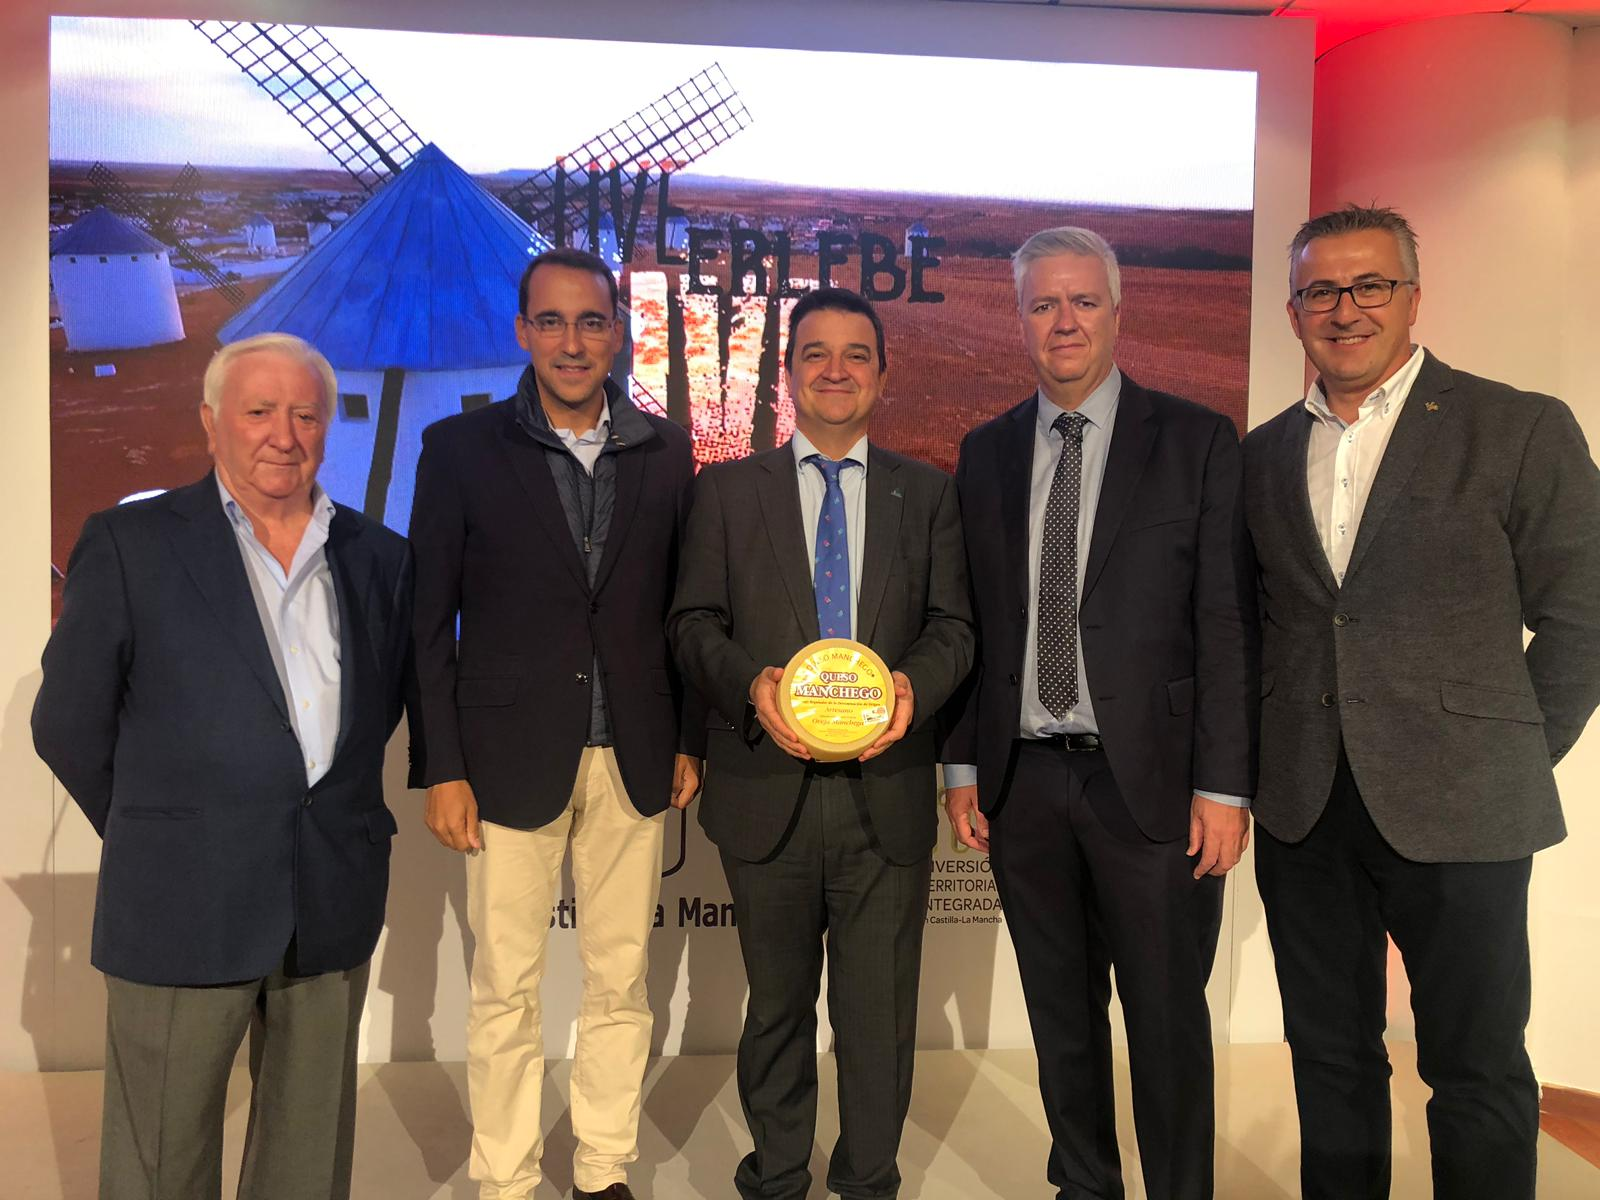 https://blog.globalcaja.es/wp-content/uploads/2019/09/Globalcaja-con-la-DO-queso-manchego.jpg